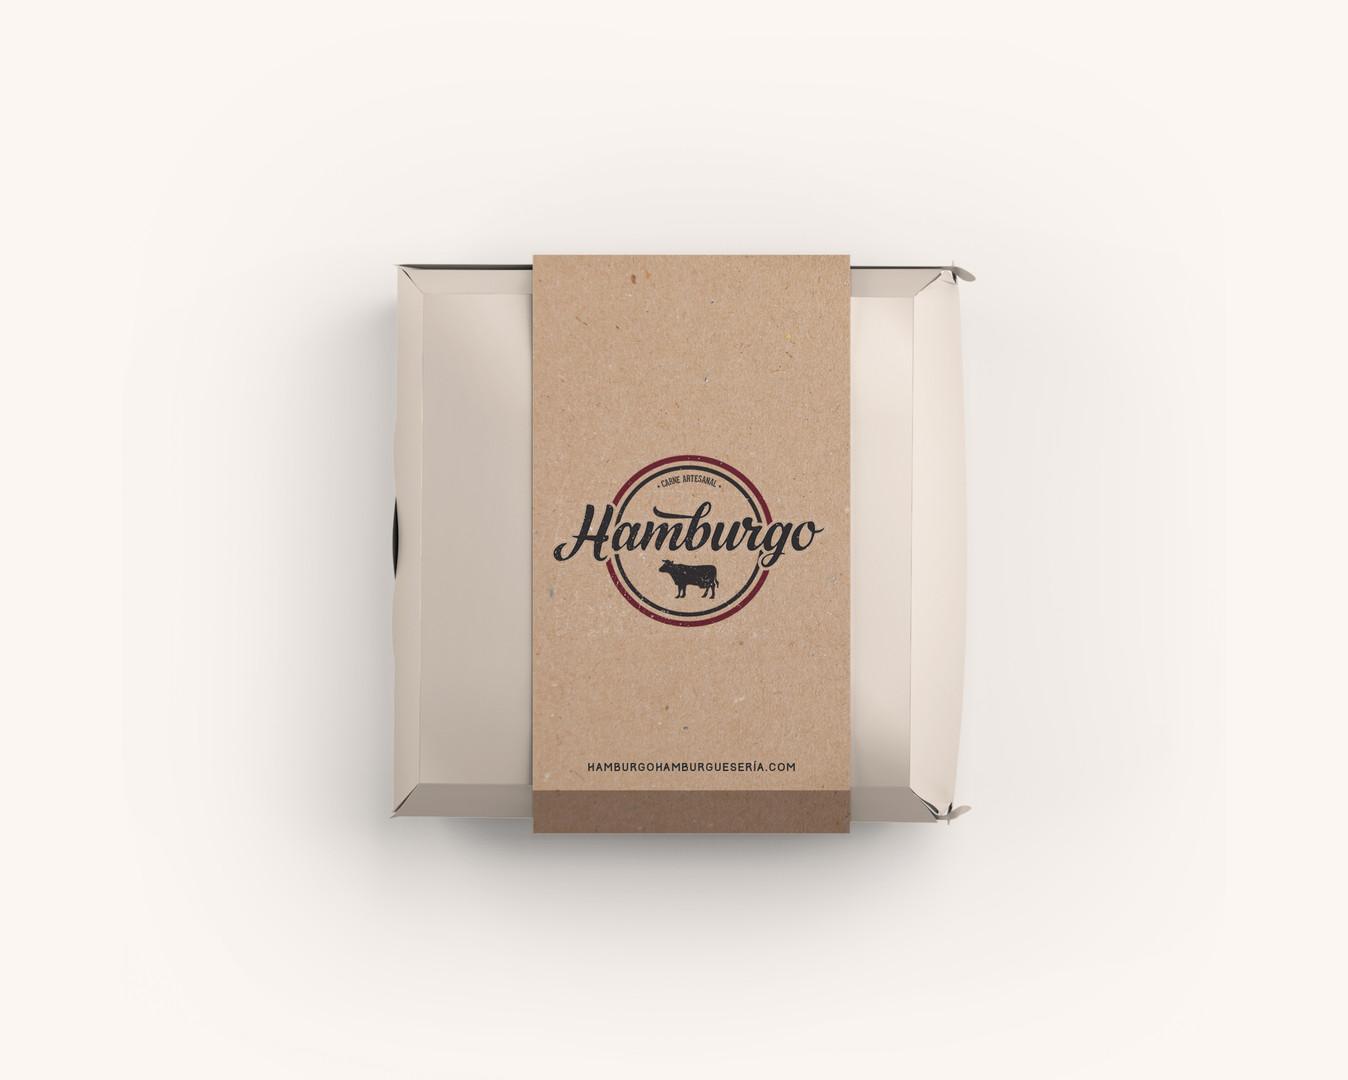 hambBurger Box Mockup.jpg